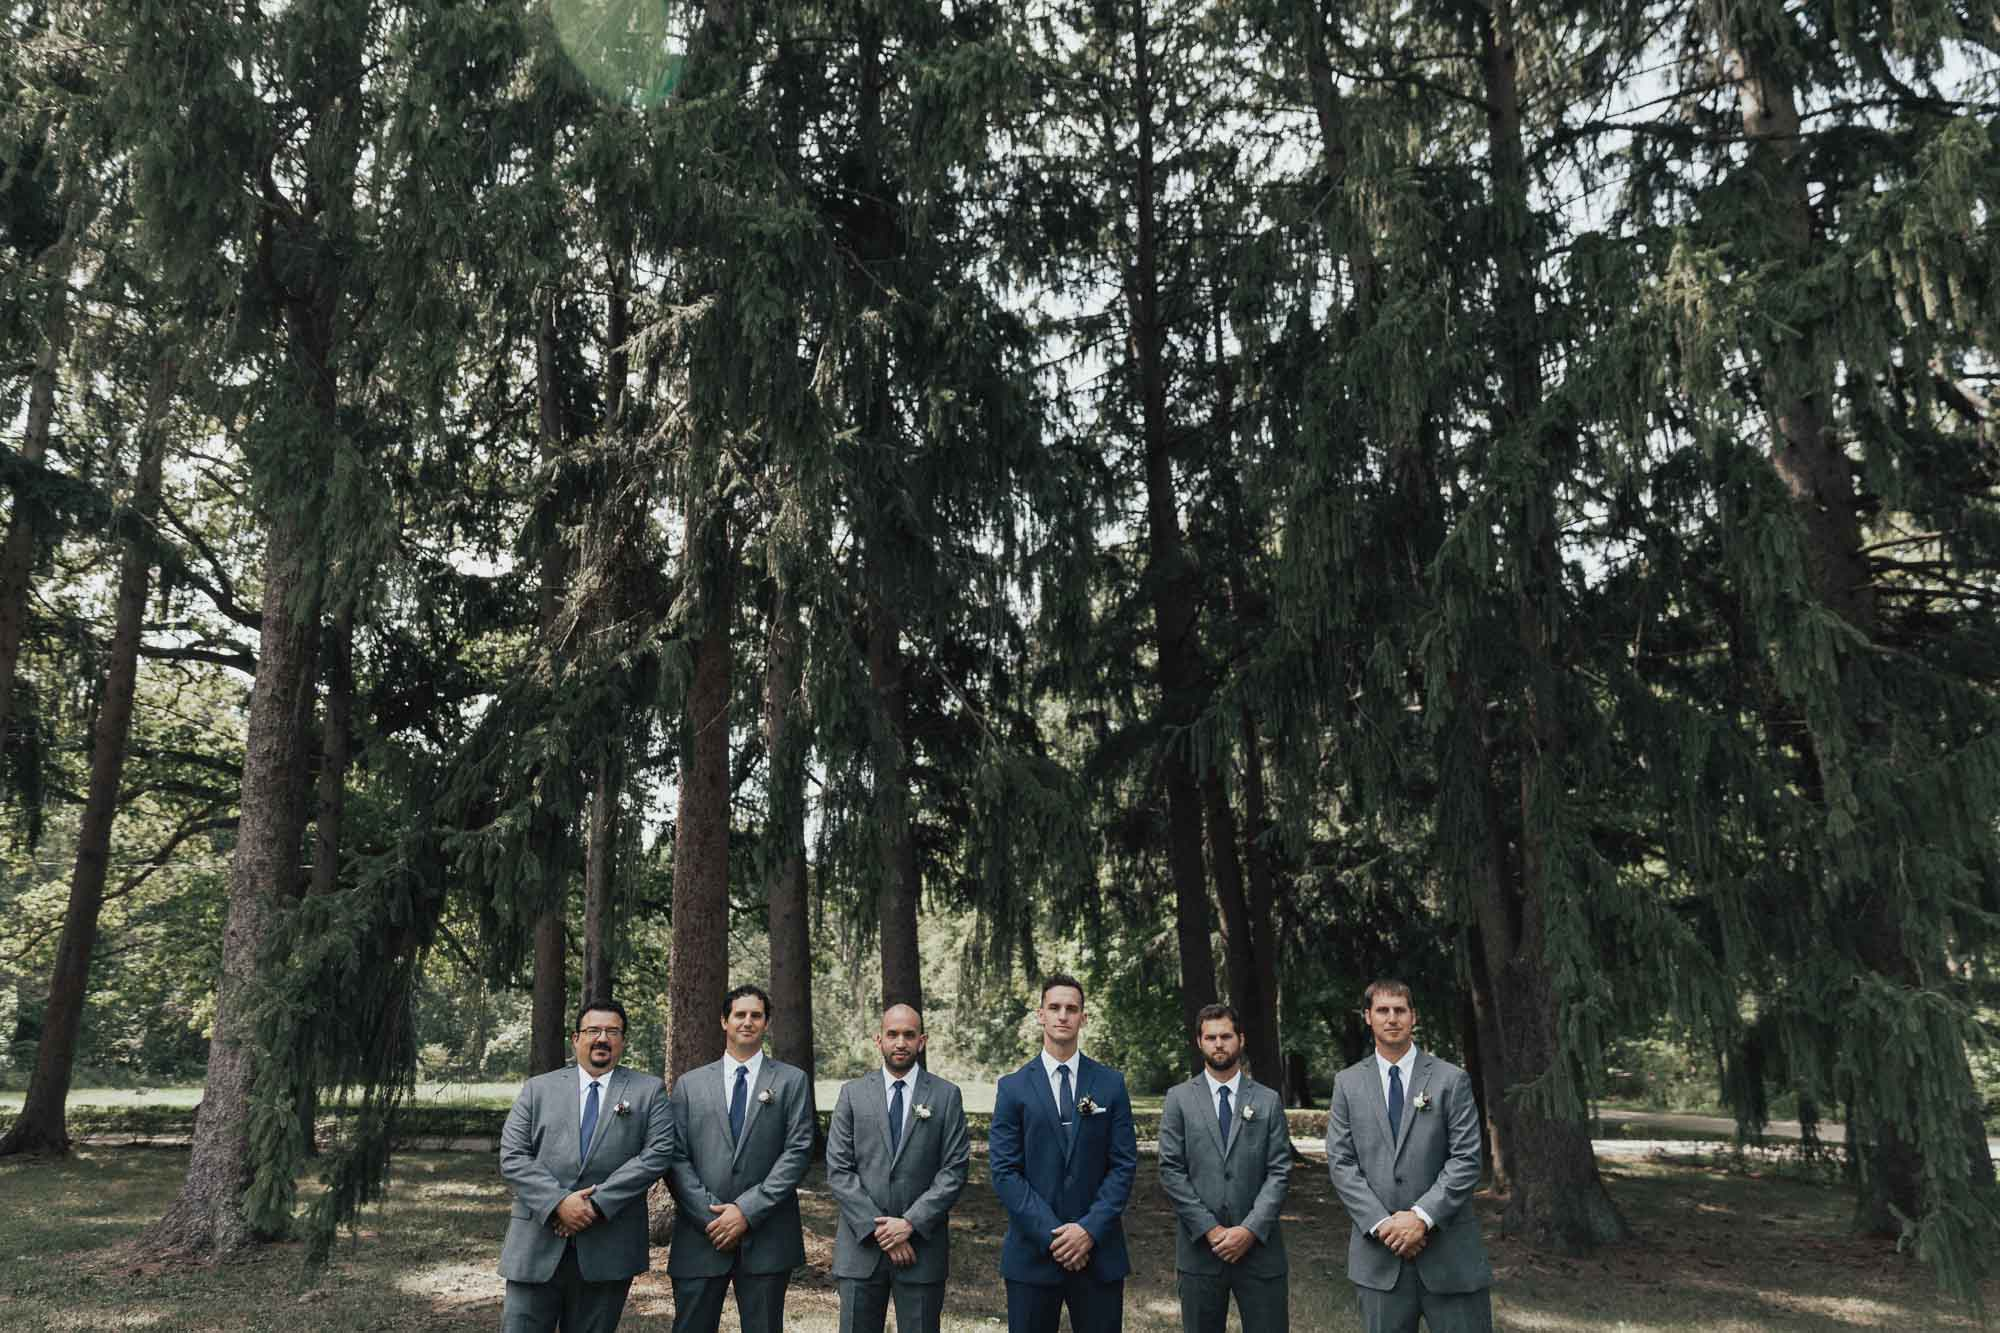 champaign_il_wedding_photography-0118.jpg